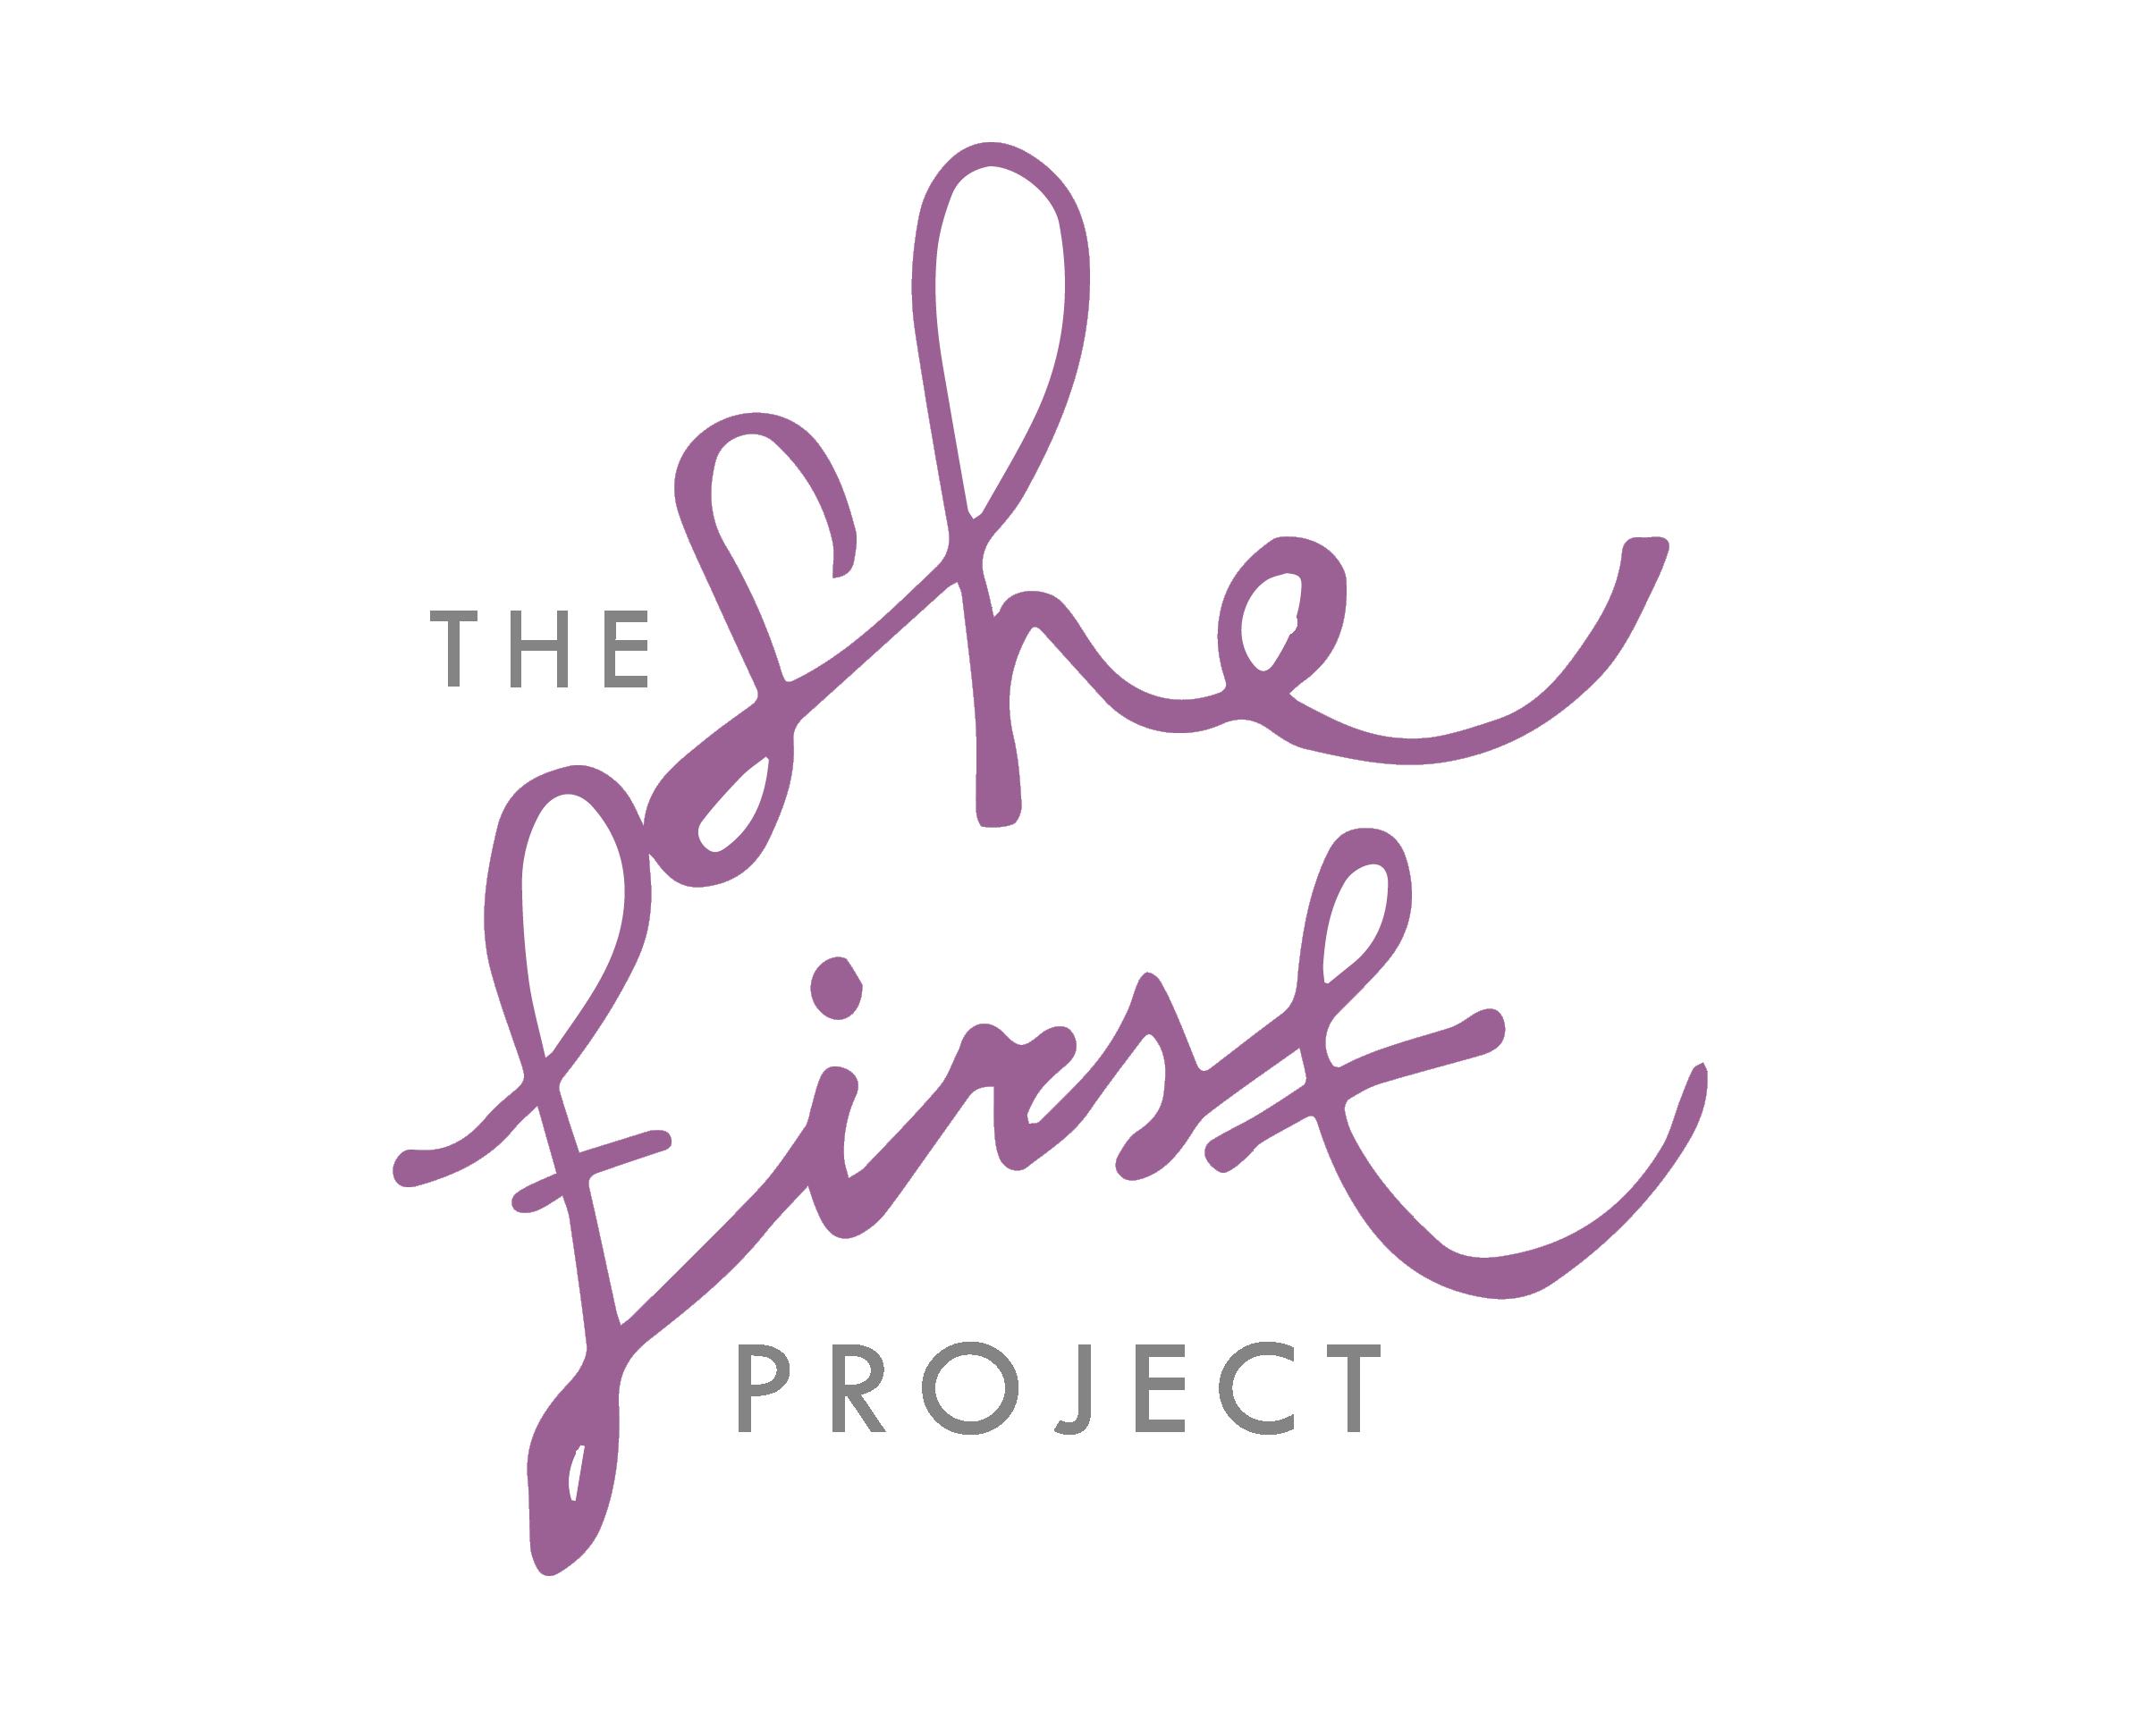 SheFirstProject-09.png